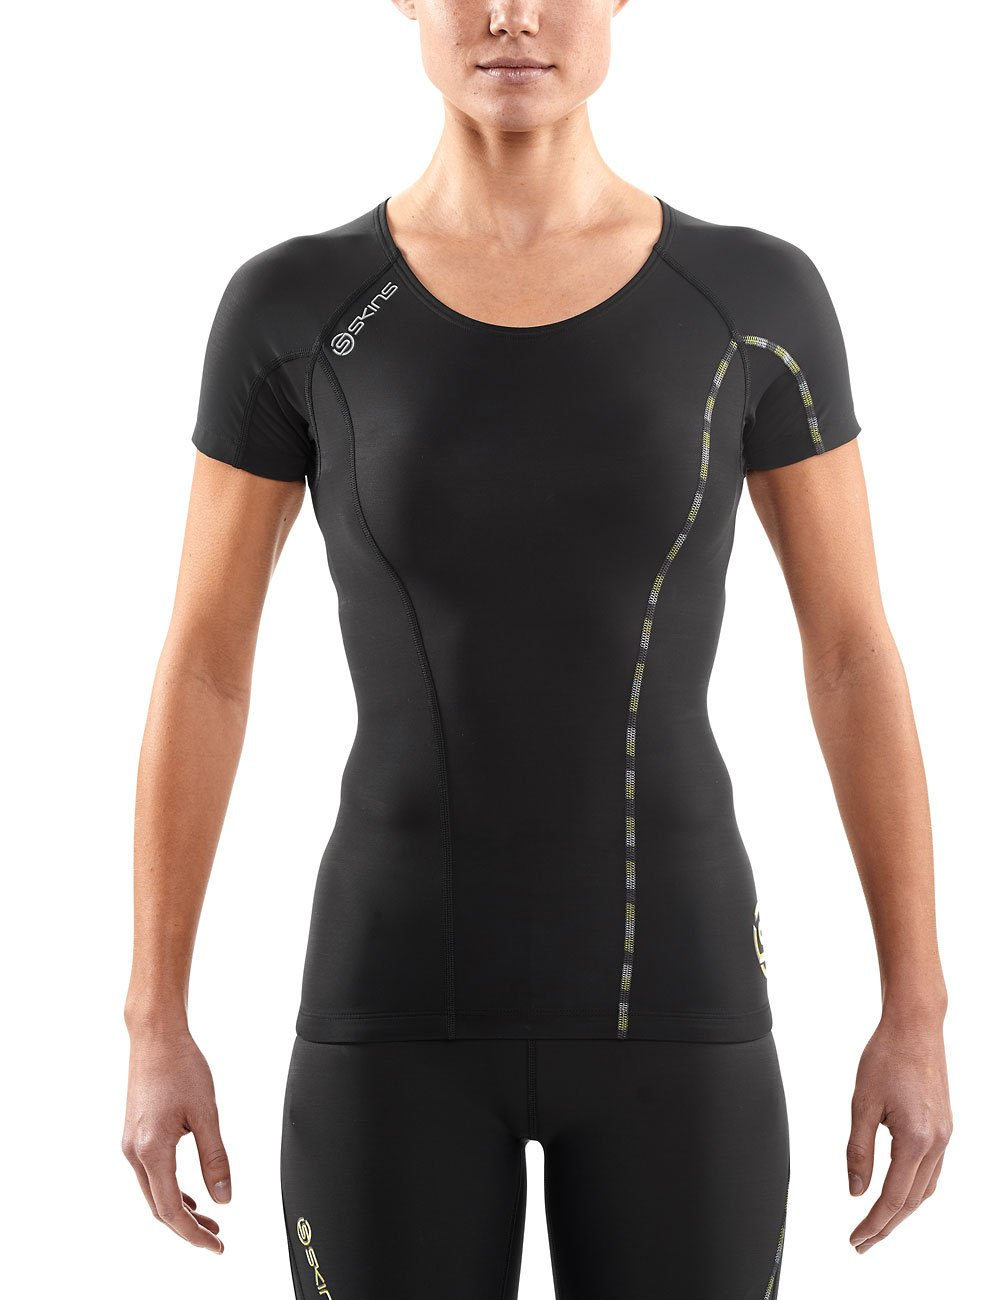 Skins Damen DNAmic Short Sleeve Top S/s